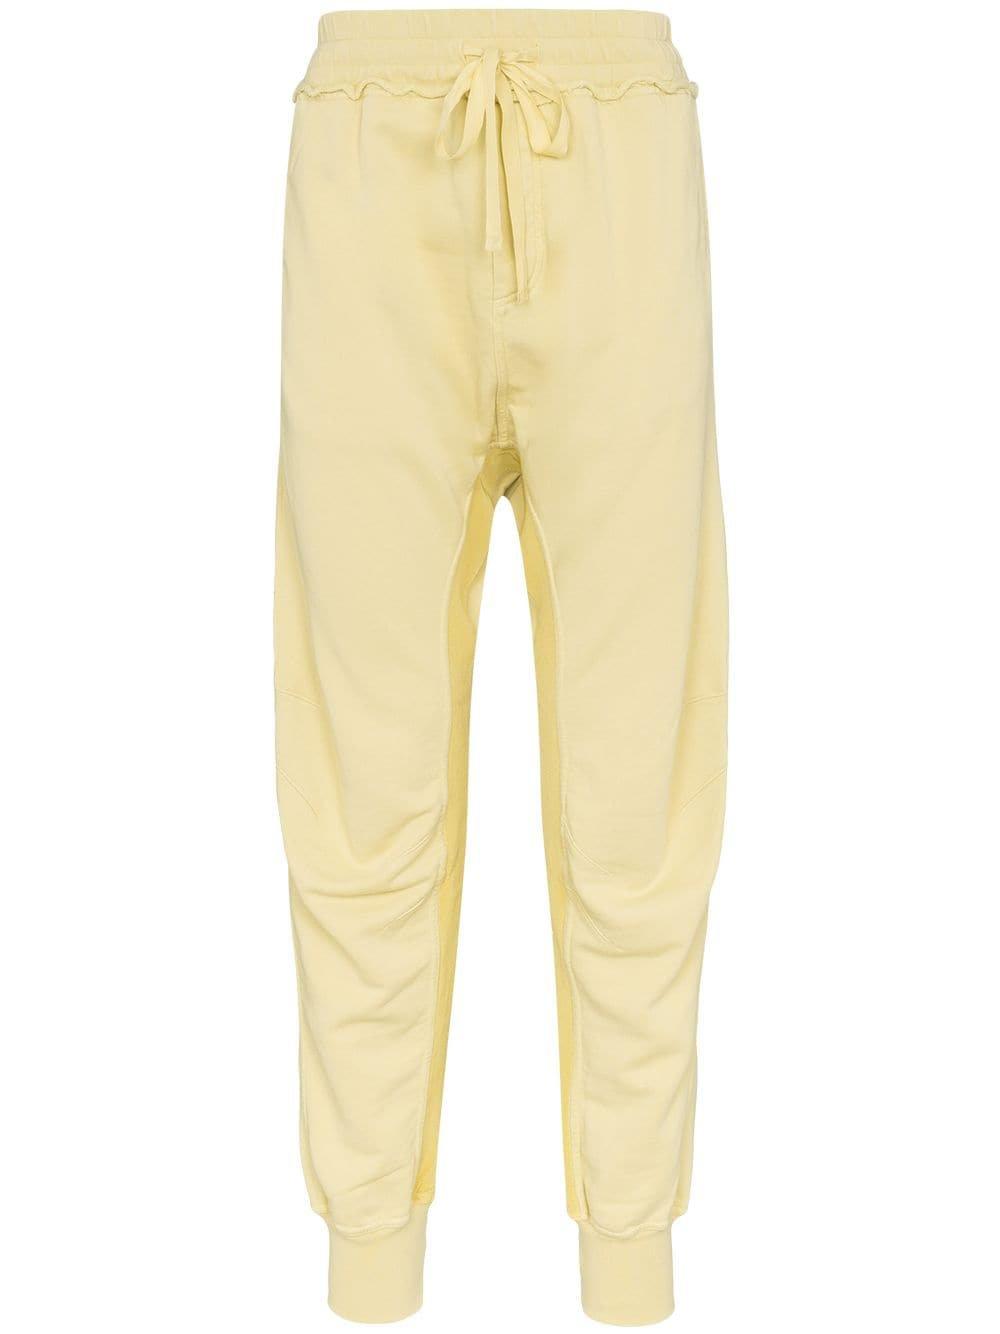 Haider Ackermann Moonshape Perth Track Trousers